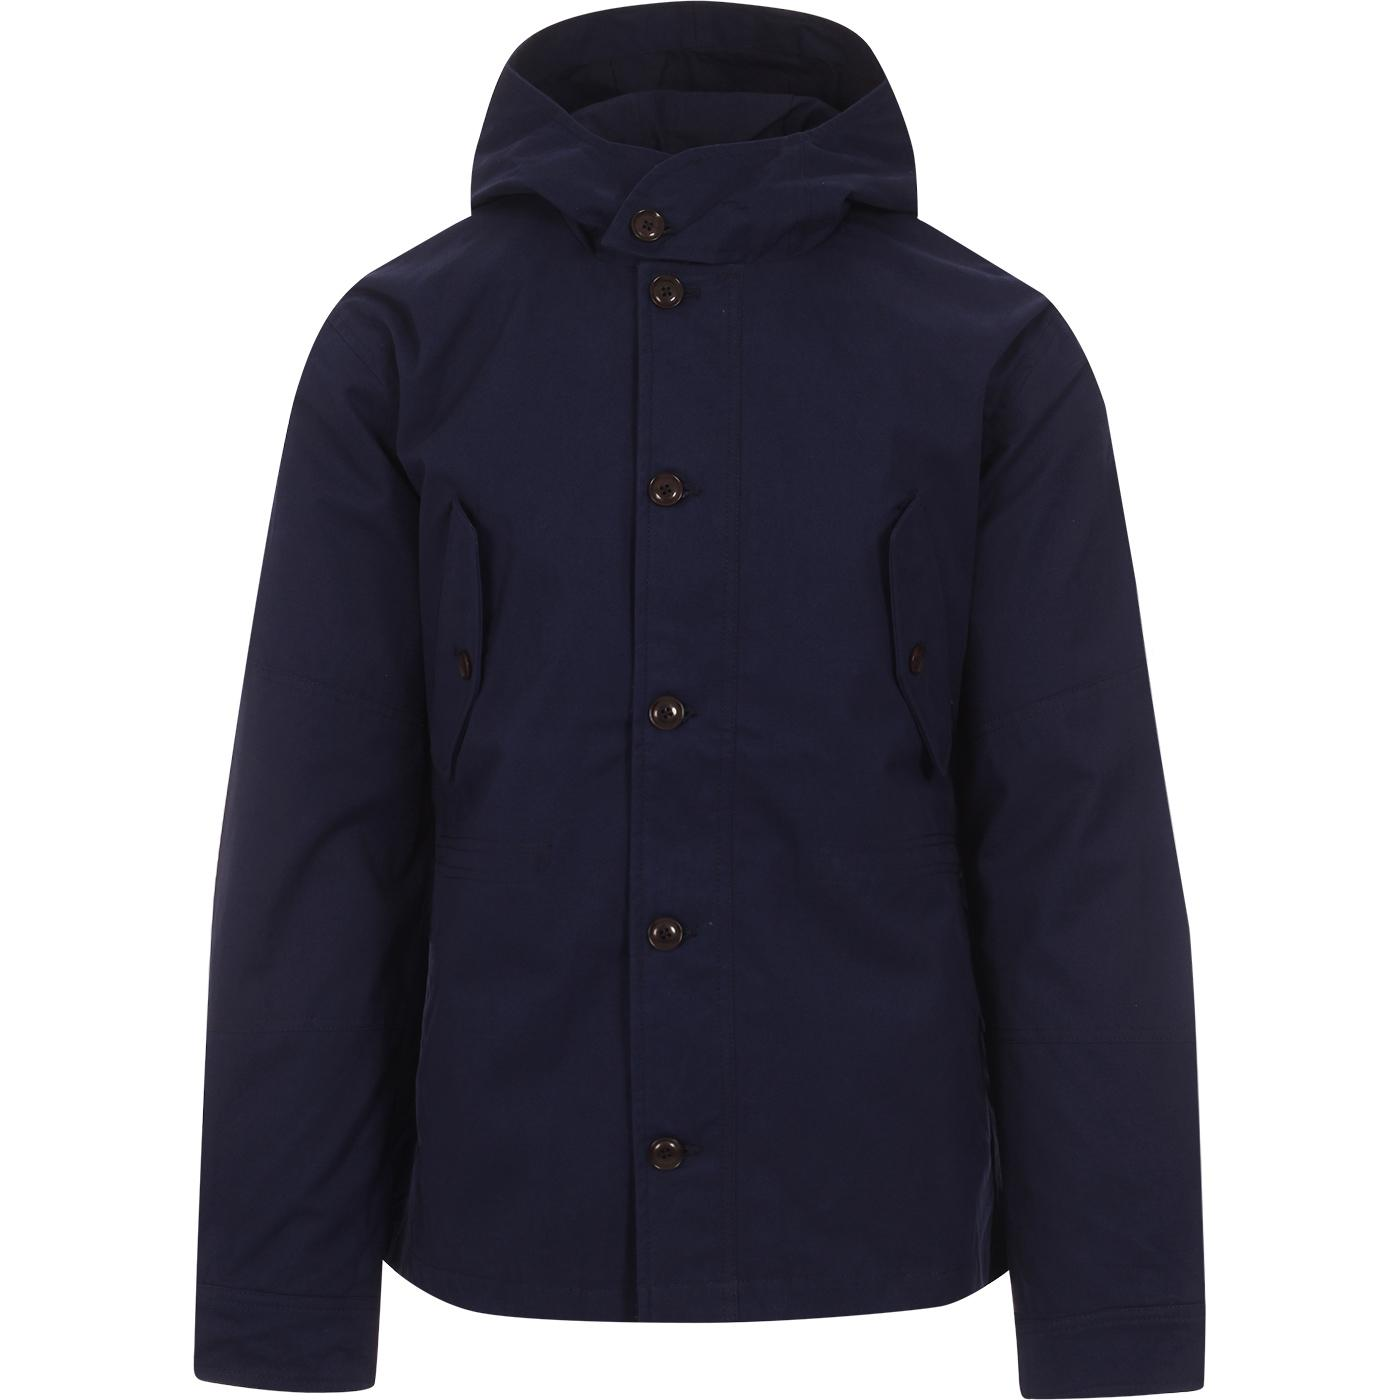 BEN SHERMAN Retro Mod Hooded Workwear Jacket